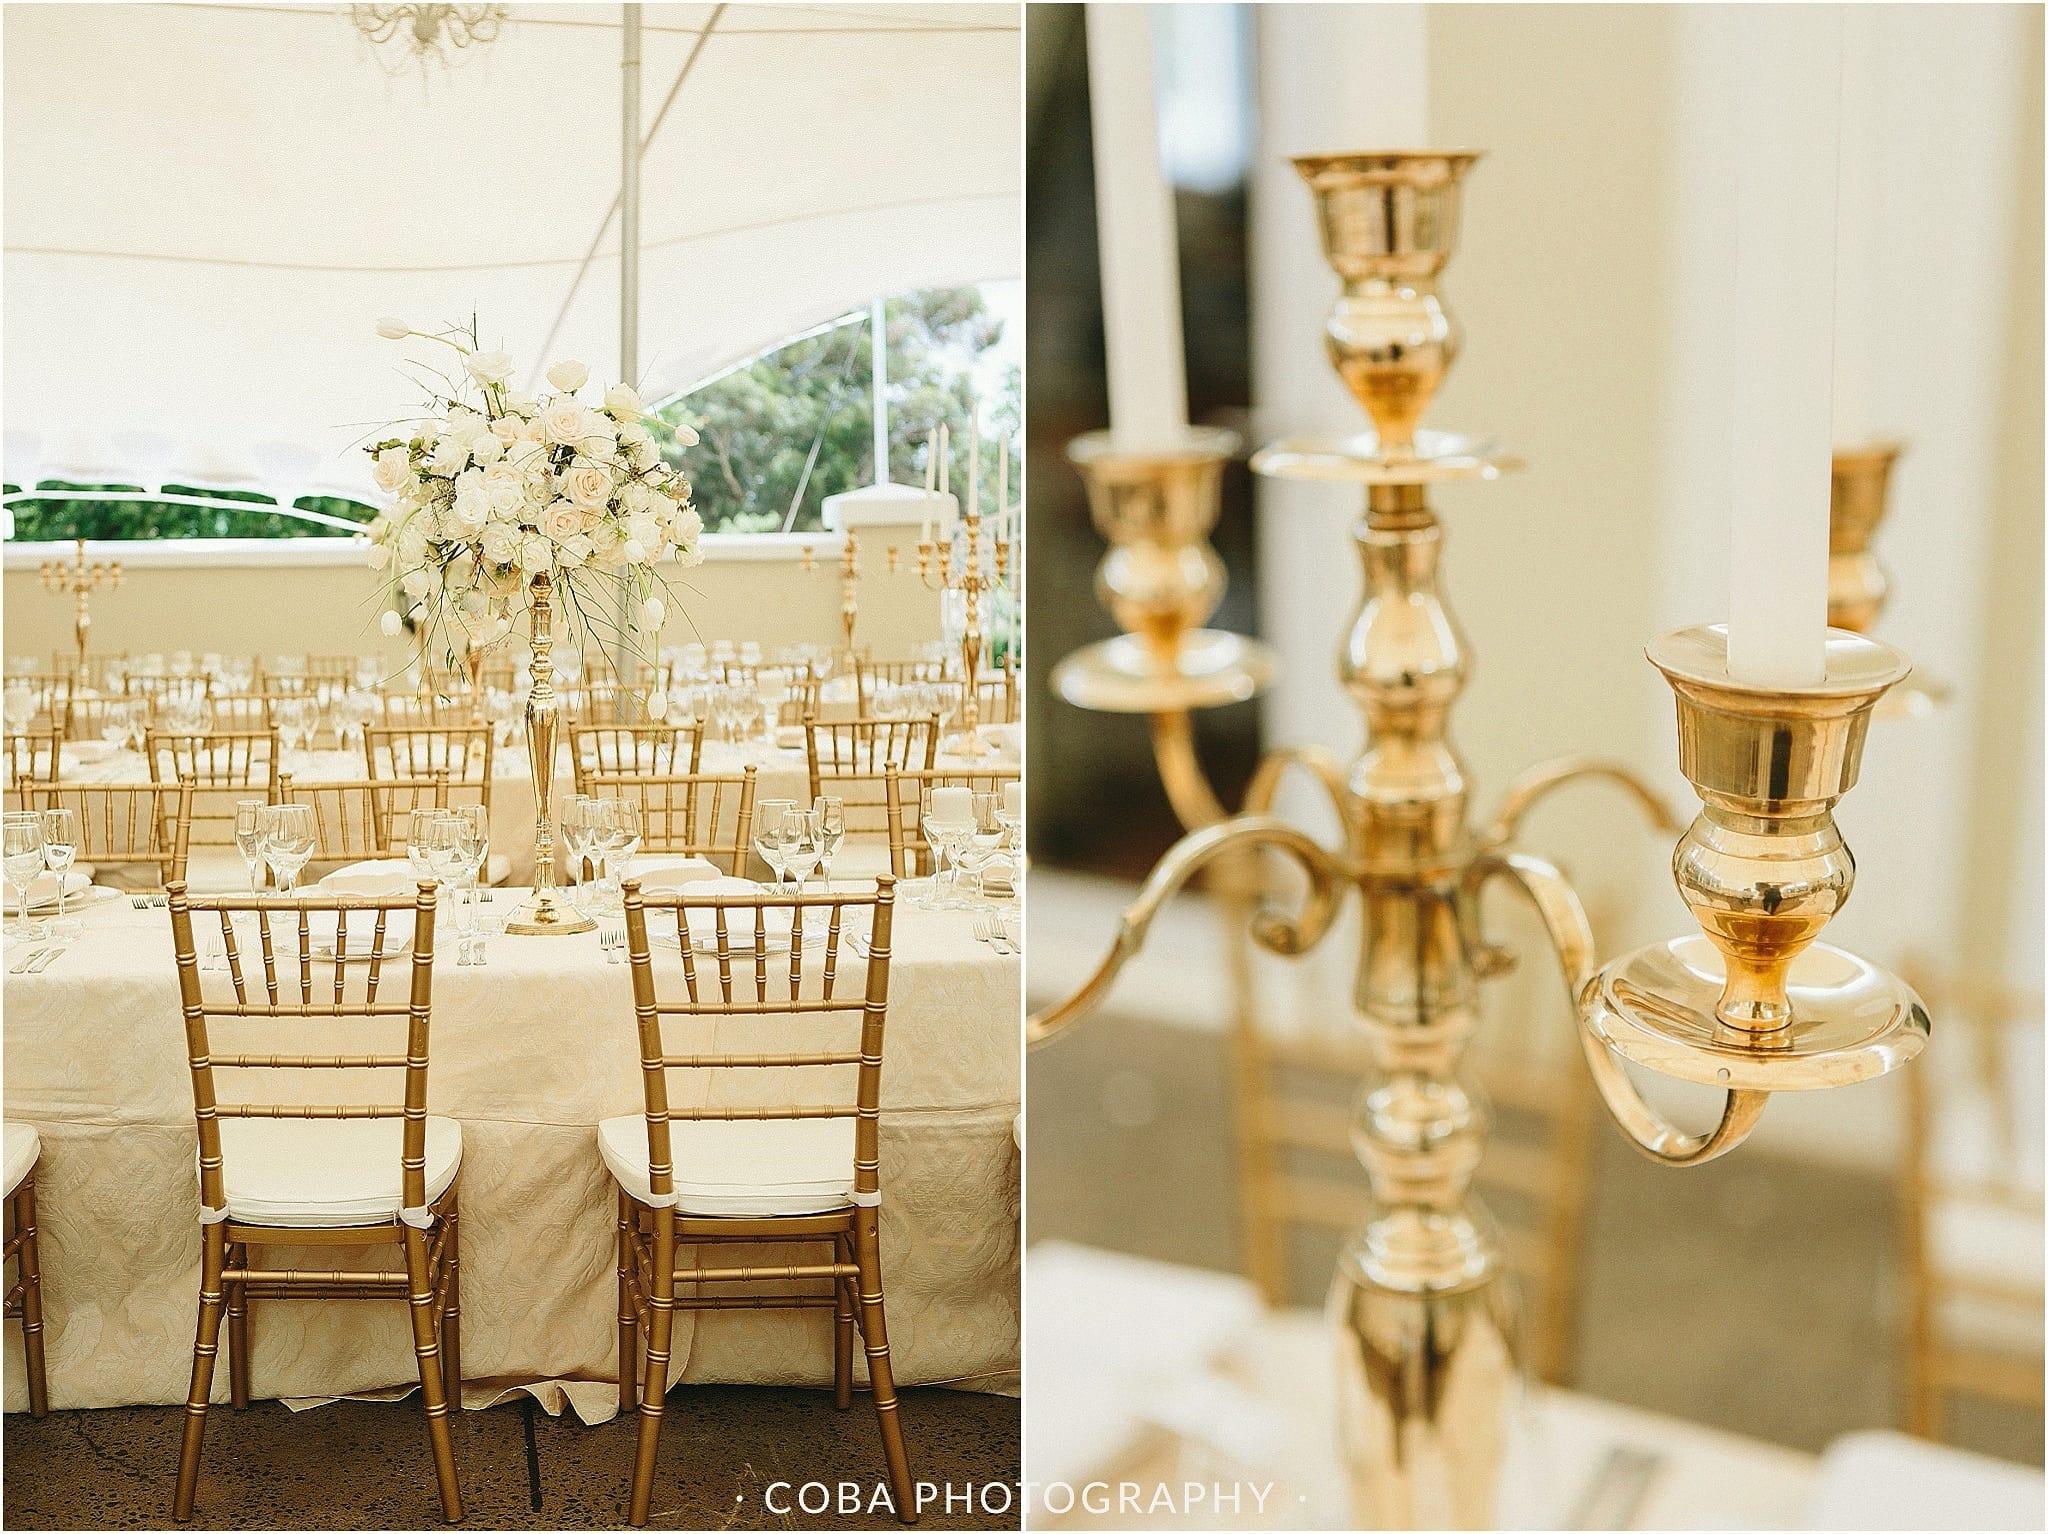 Marc&Melissa - Cascade Manor - Coba Photography (42)